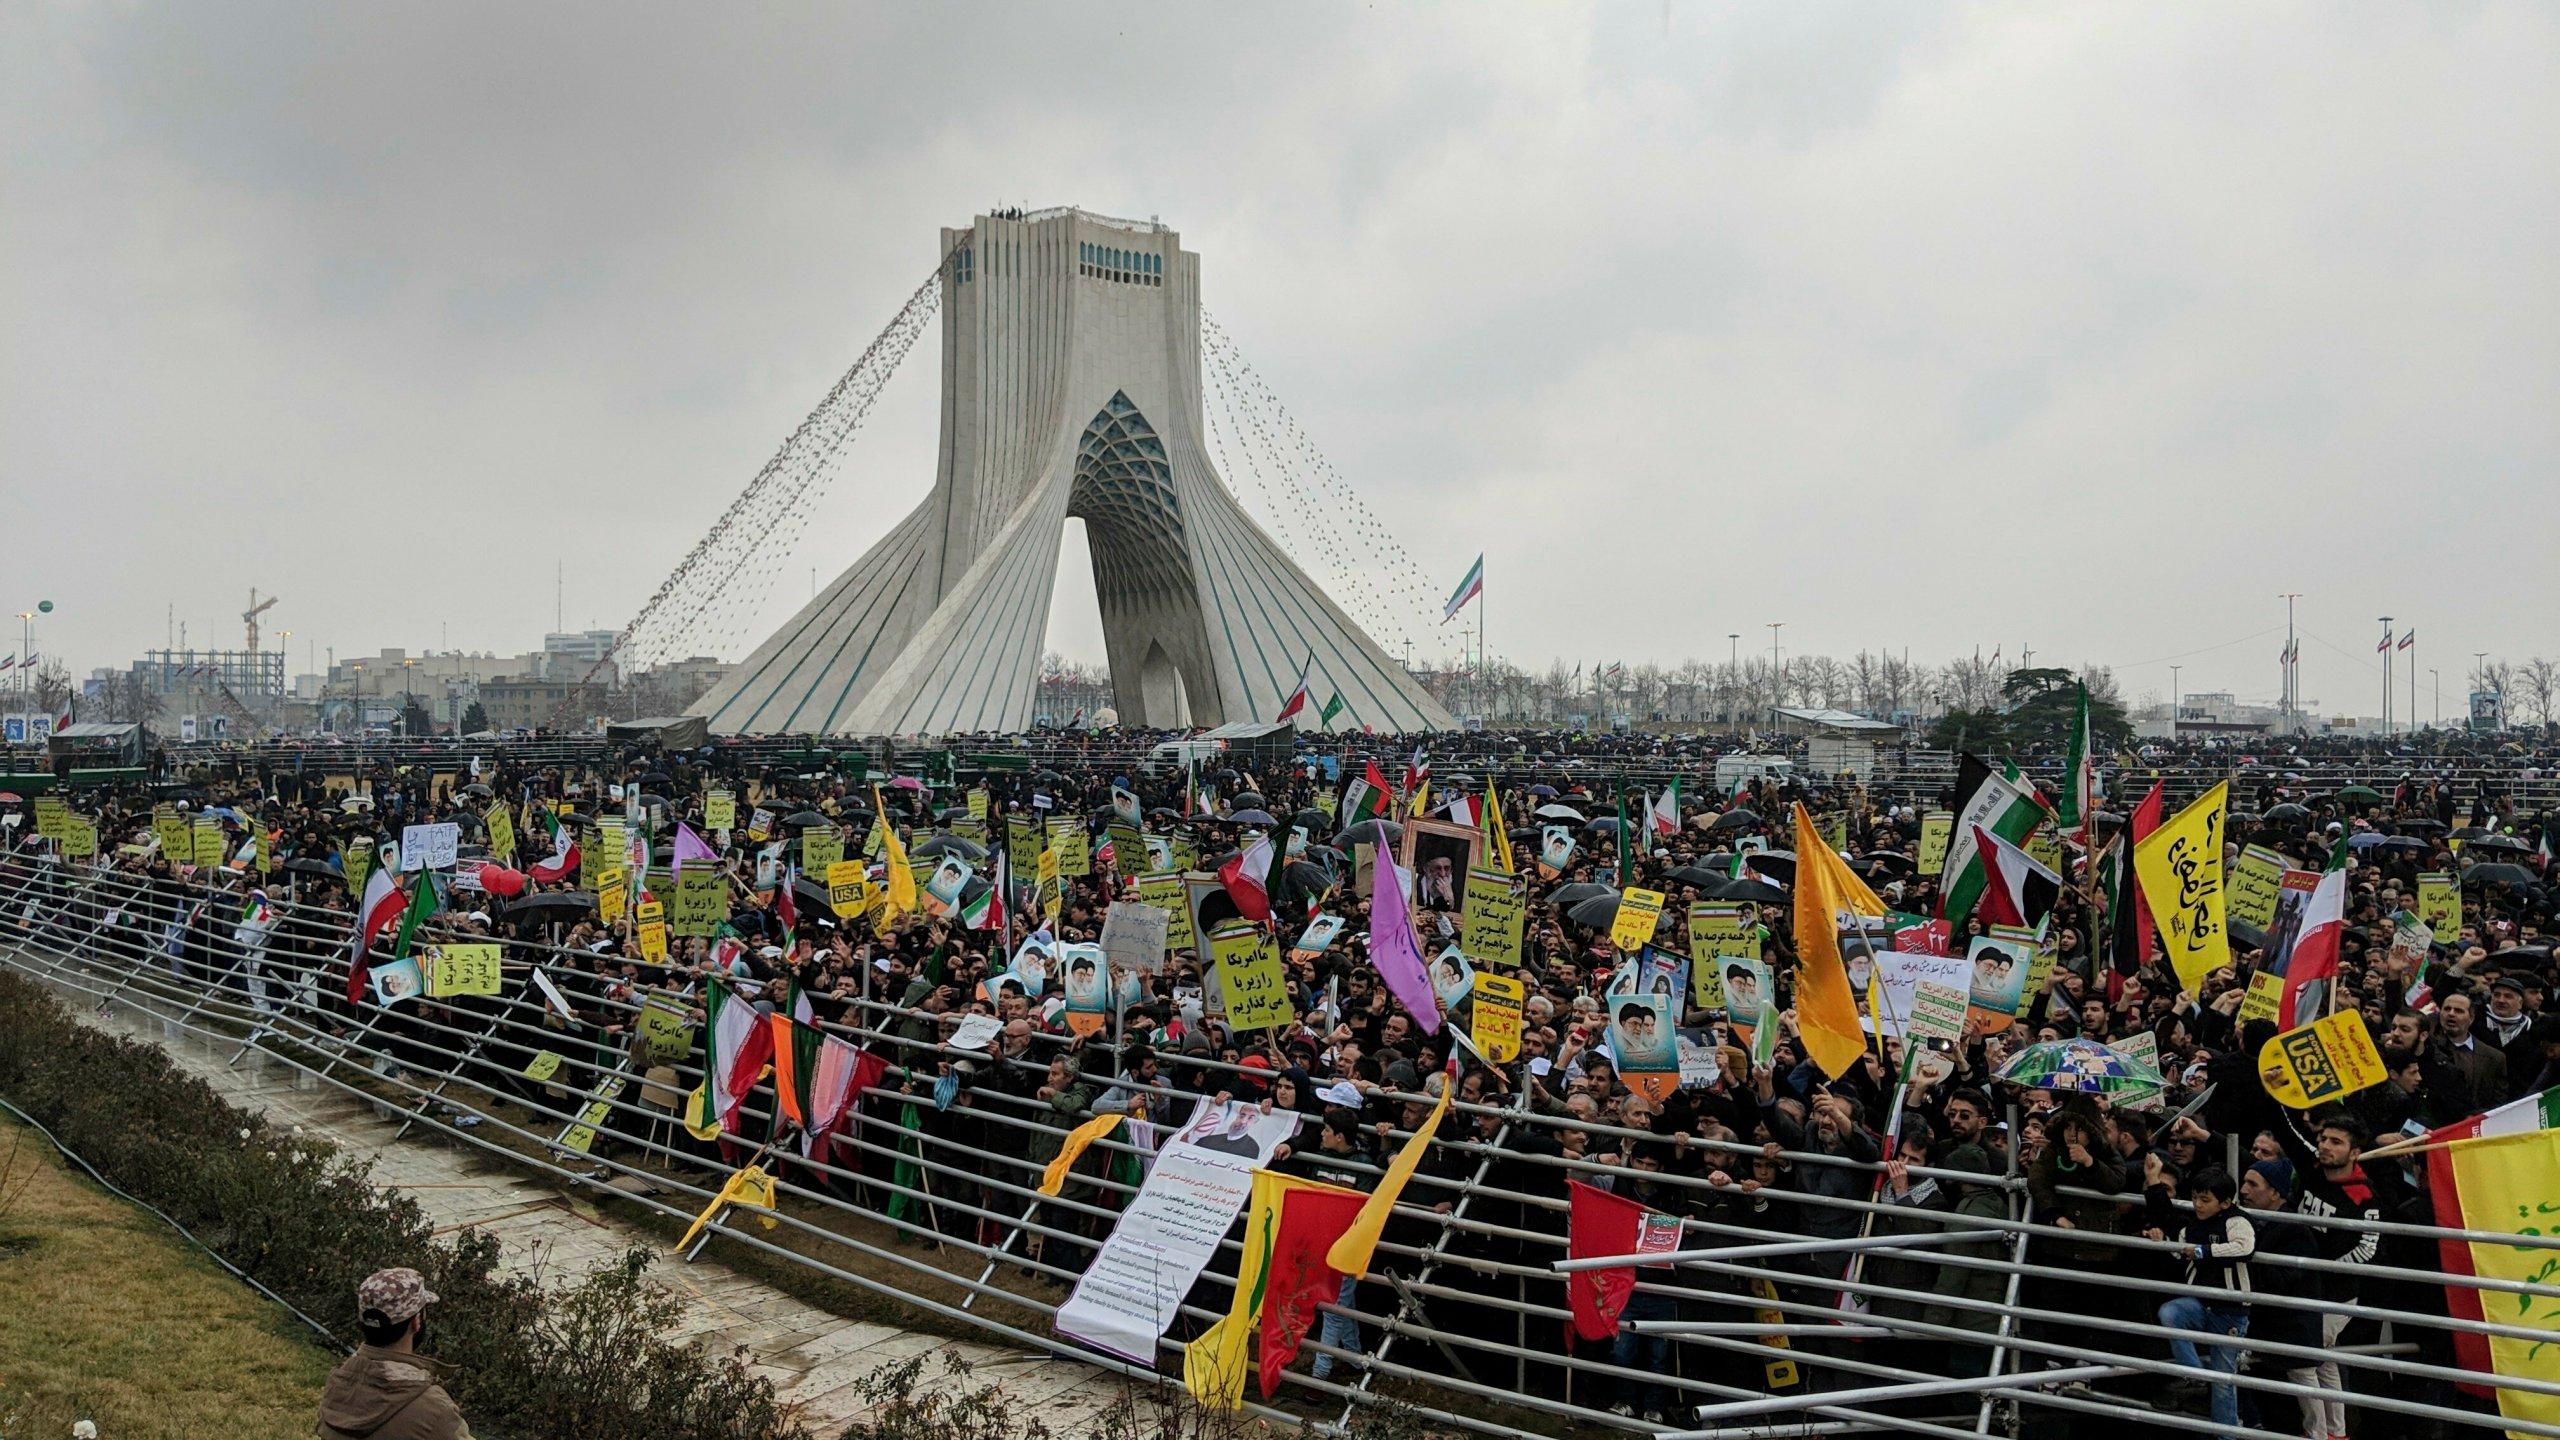 Iran_Revolution_Anniversary_59161-159532.jpg70258010